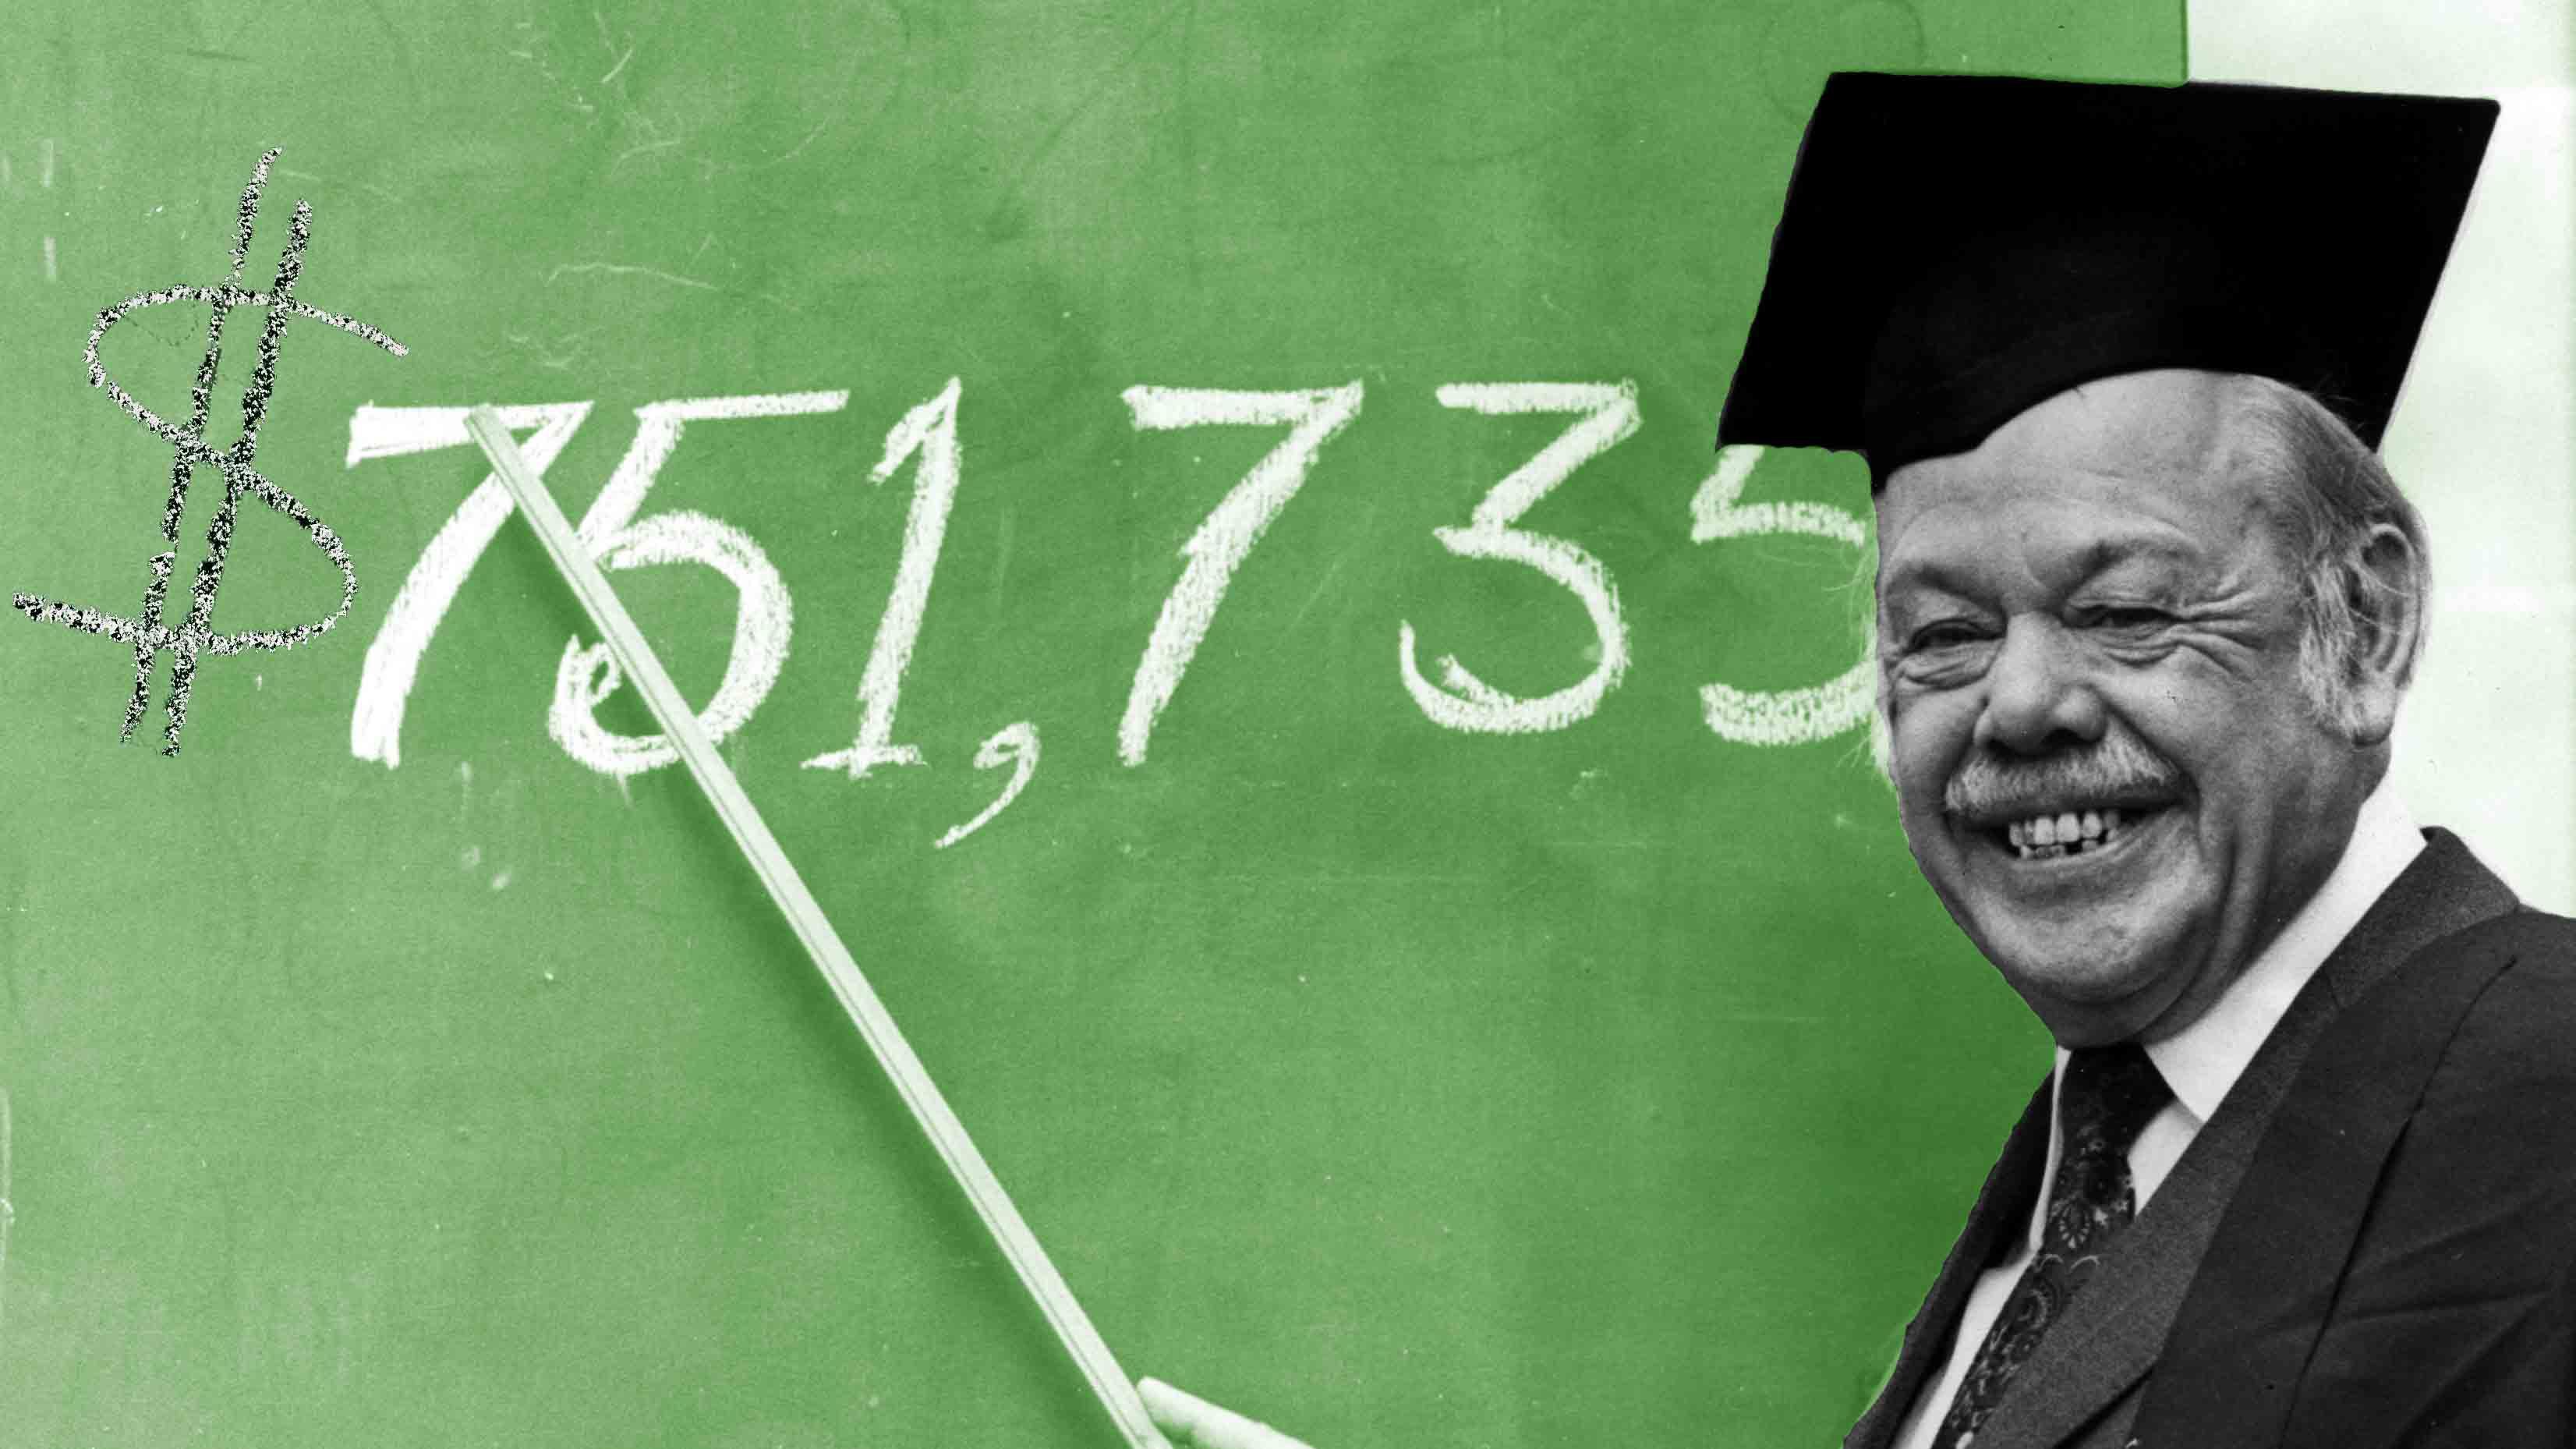 Should Teachers Make $100K? California Will Decide - Big Think